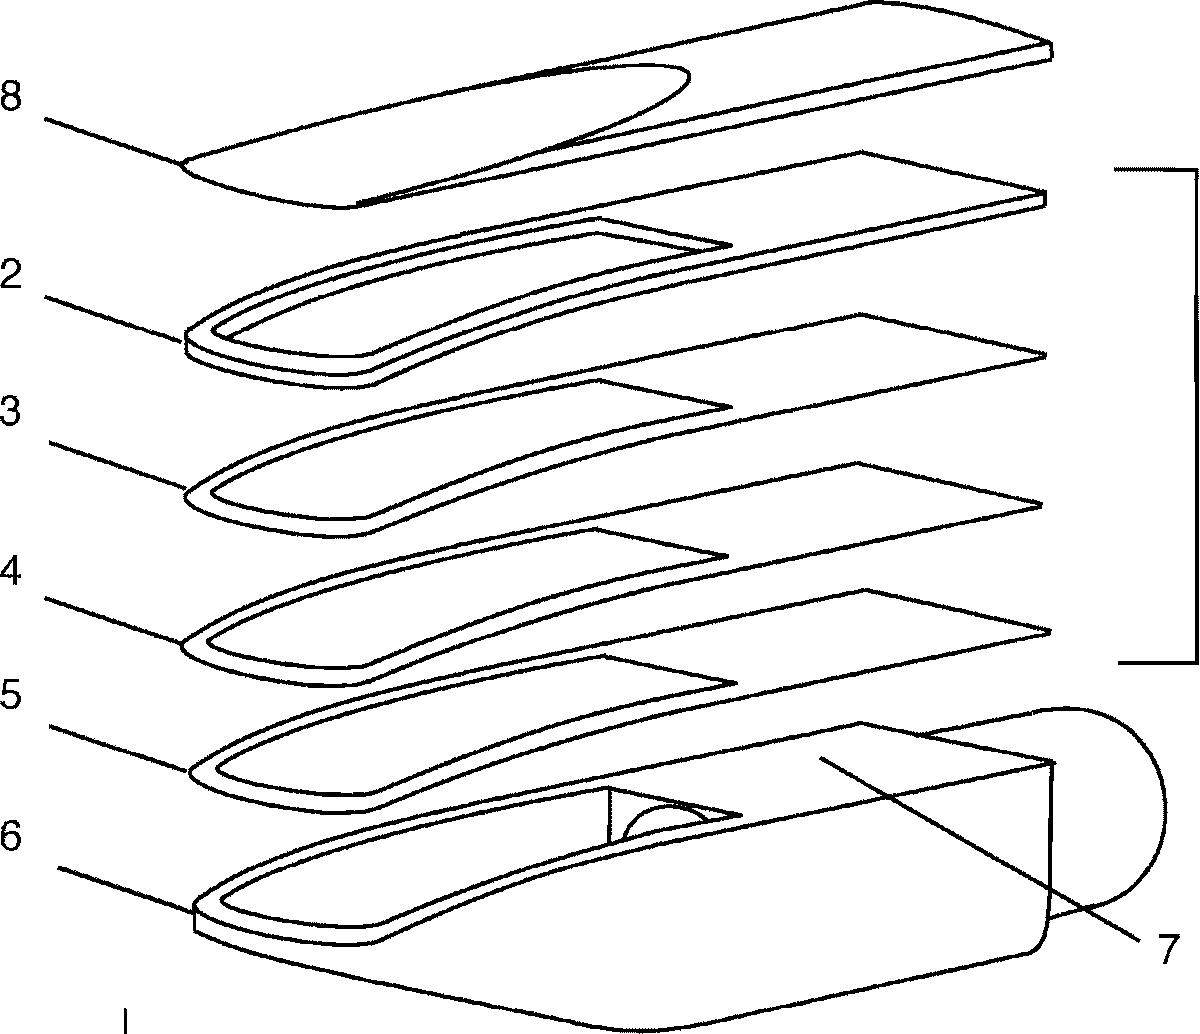 Figure GB2557937A_D0001